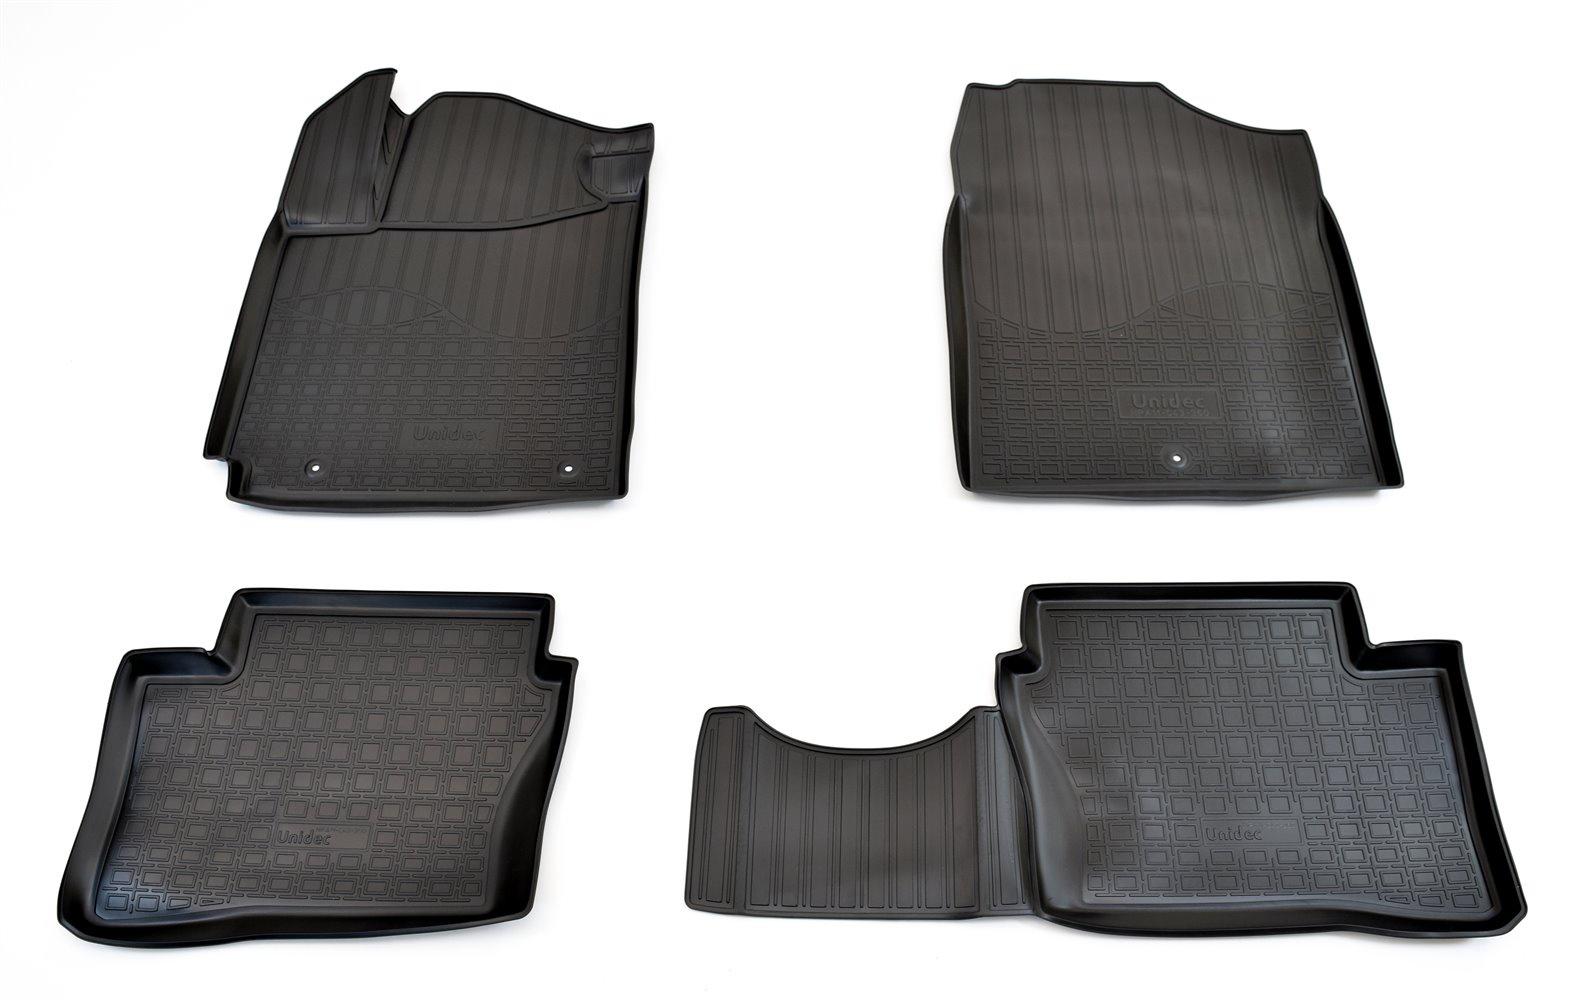 Коврики в салон автомобиля Norplast для Kia Picanto (JA) 3D (2017), NPA11-C43-360, черный для автомобиля 2017